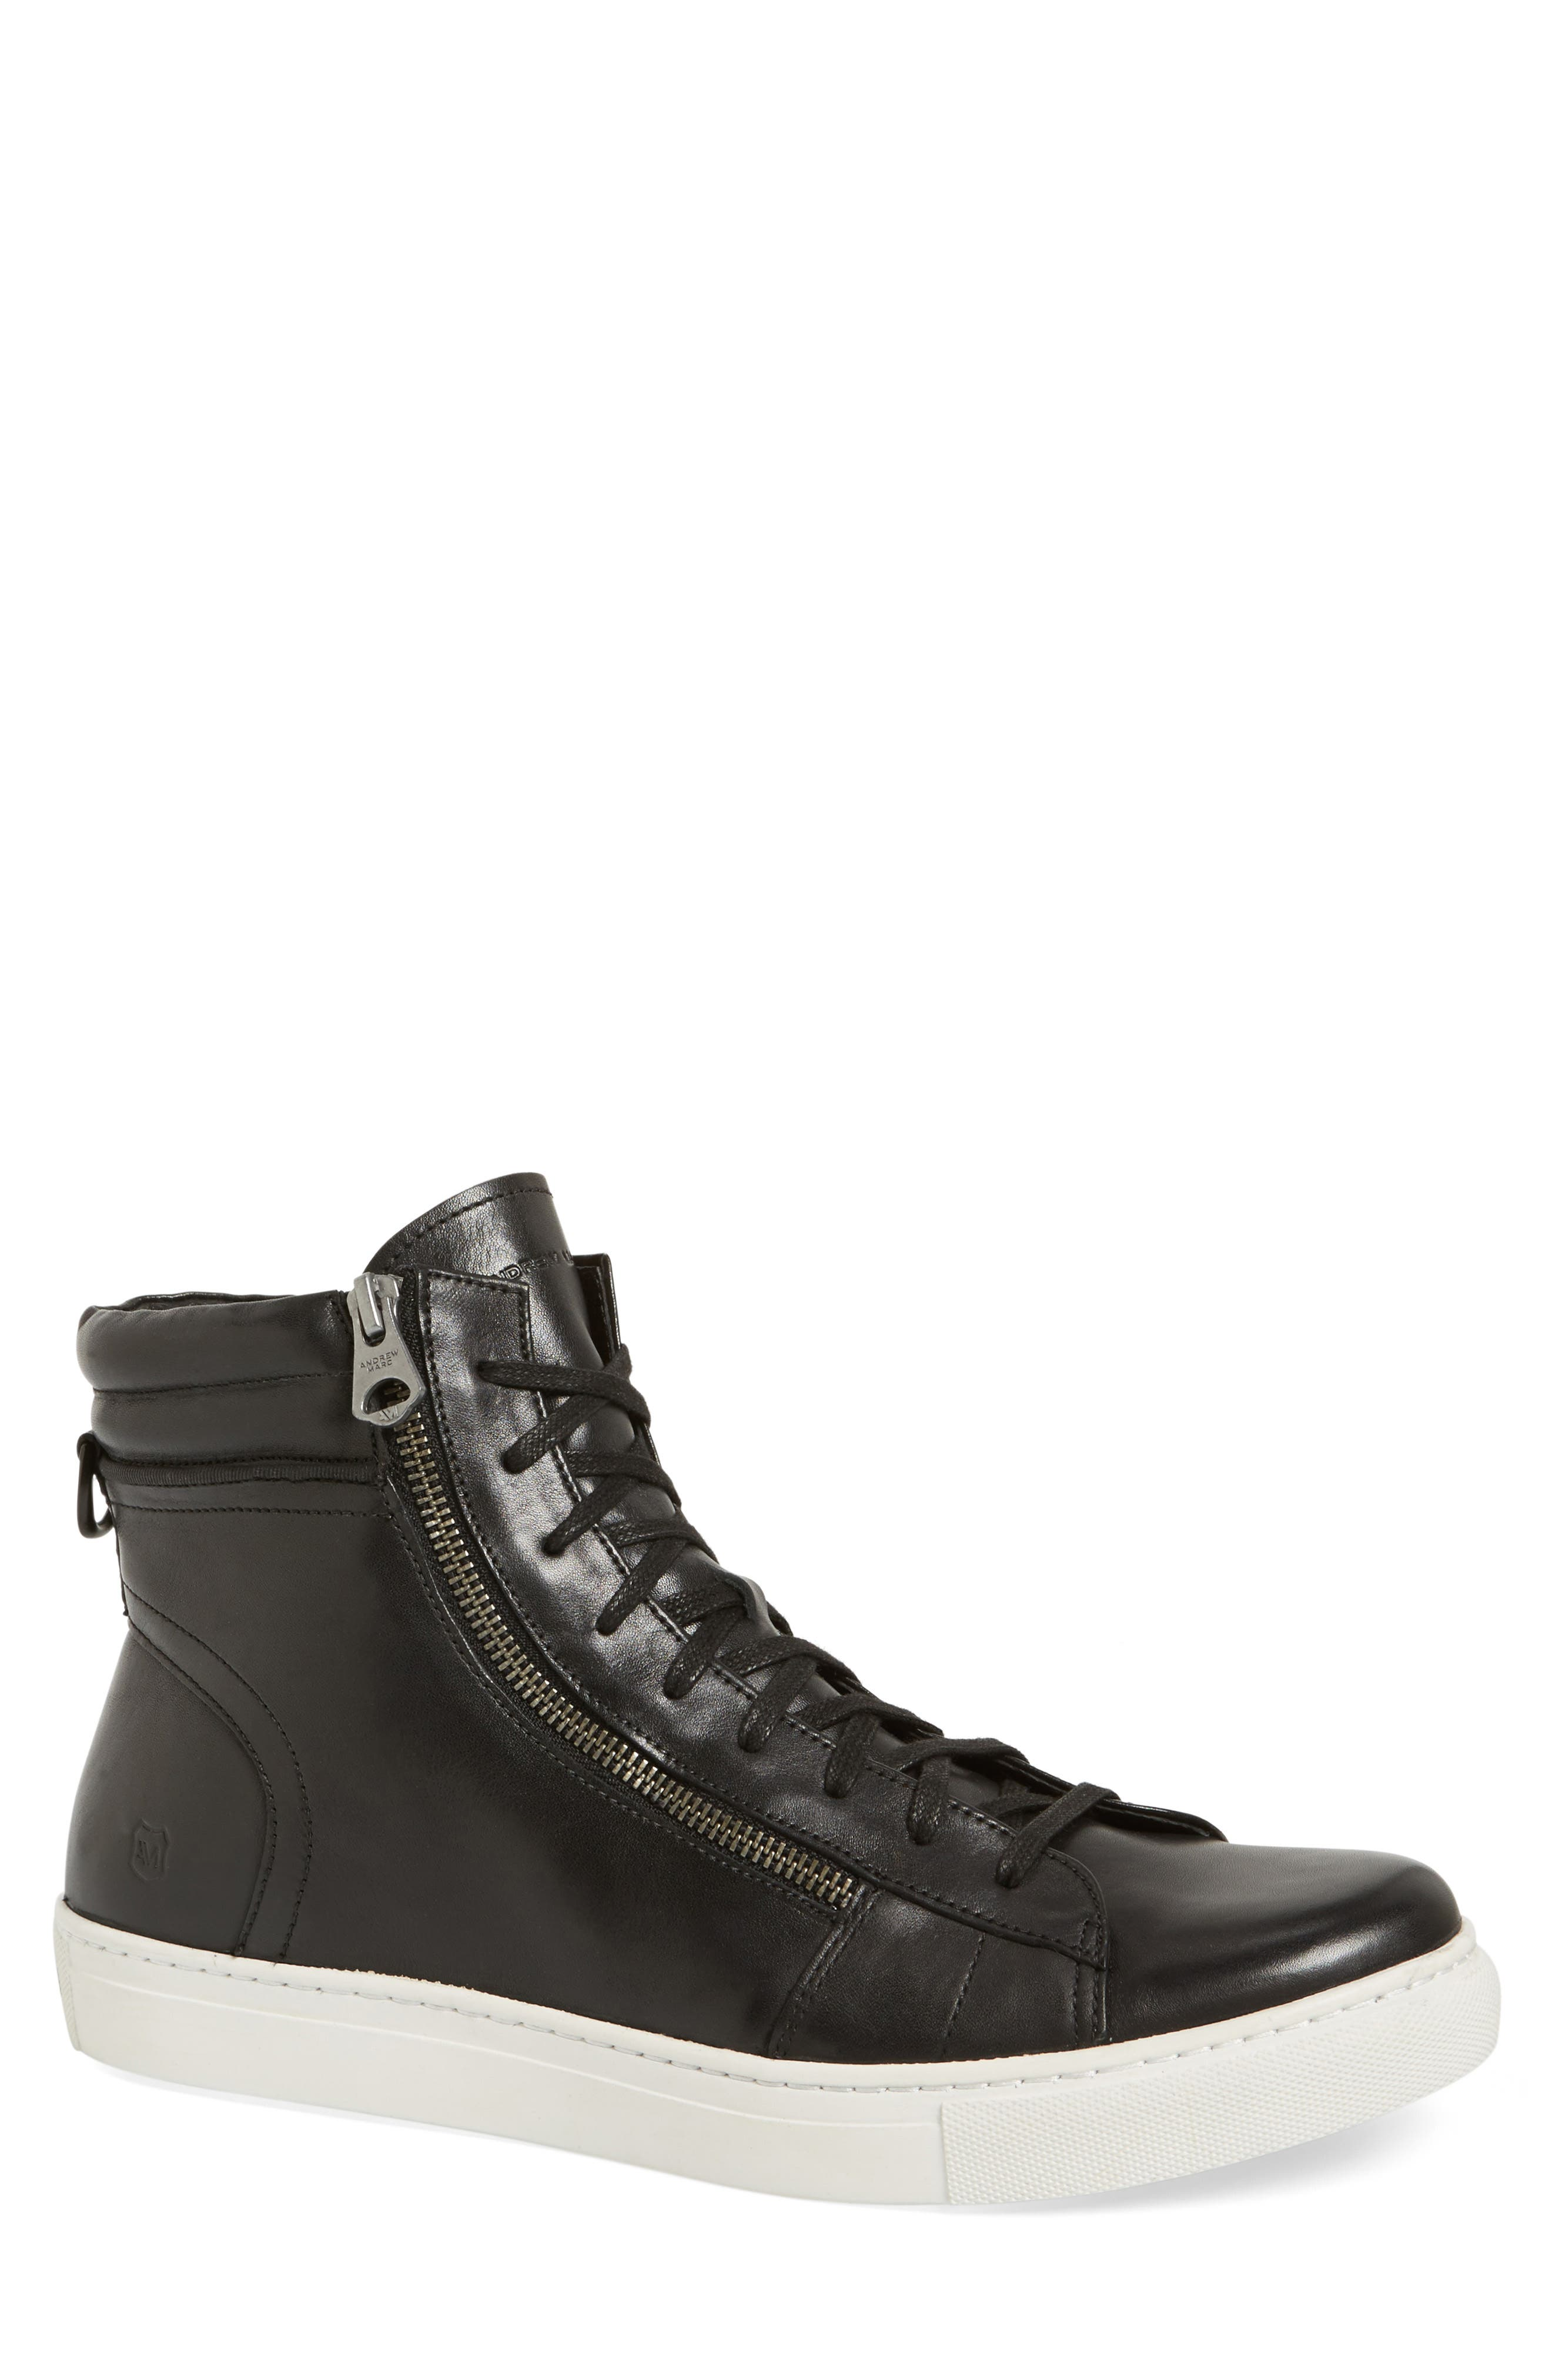 Remsen Sneaker,                         Main,                         color, 006